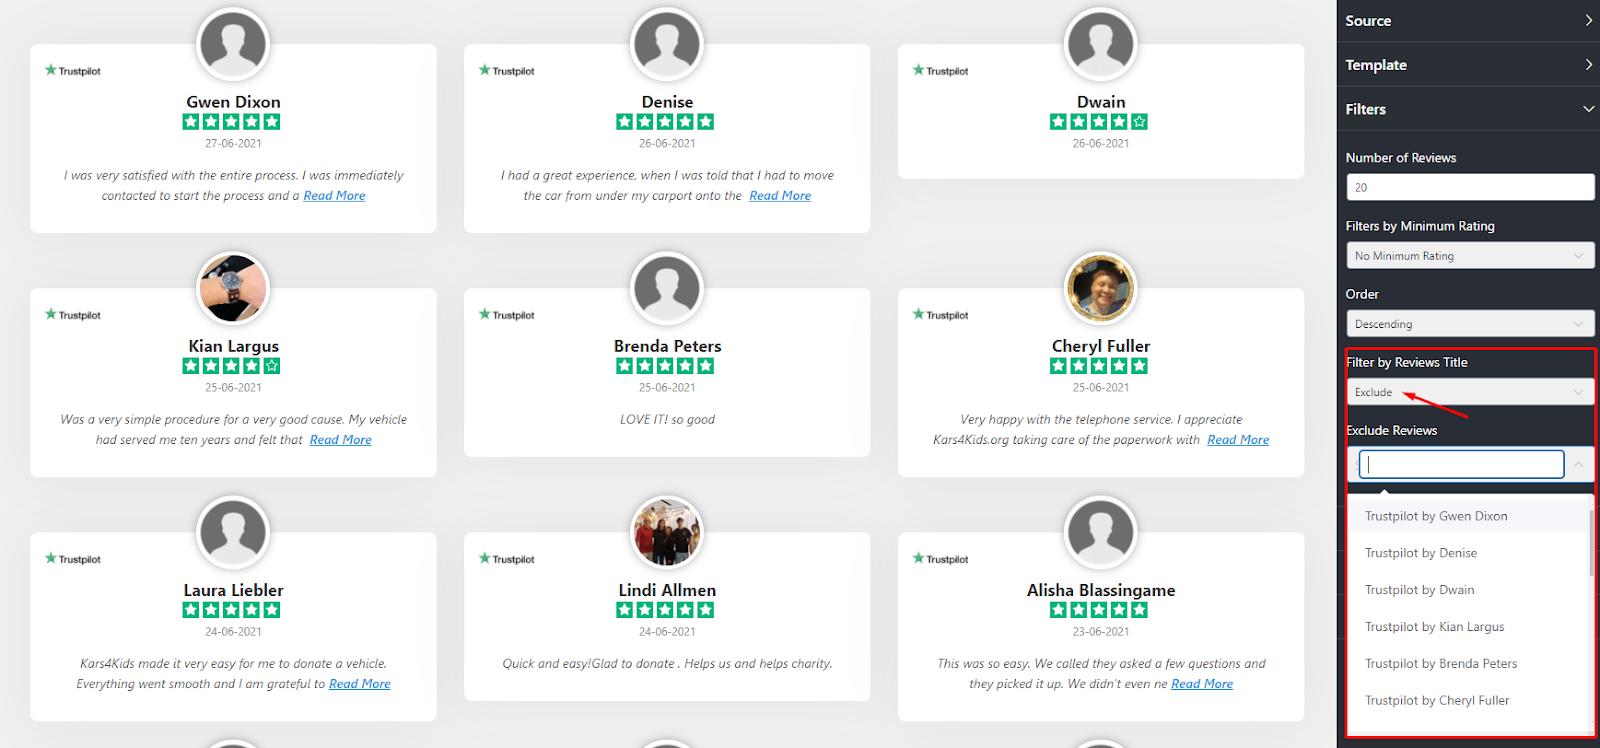 Trustpilot reviews exclude